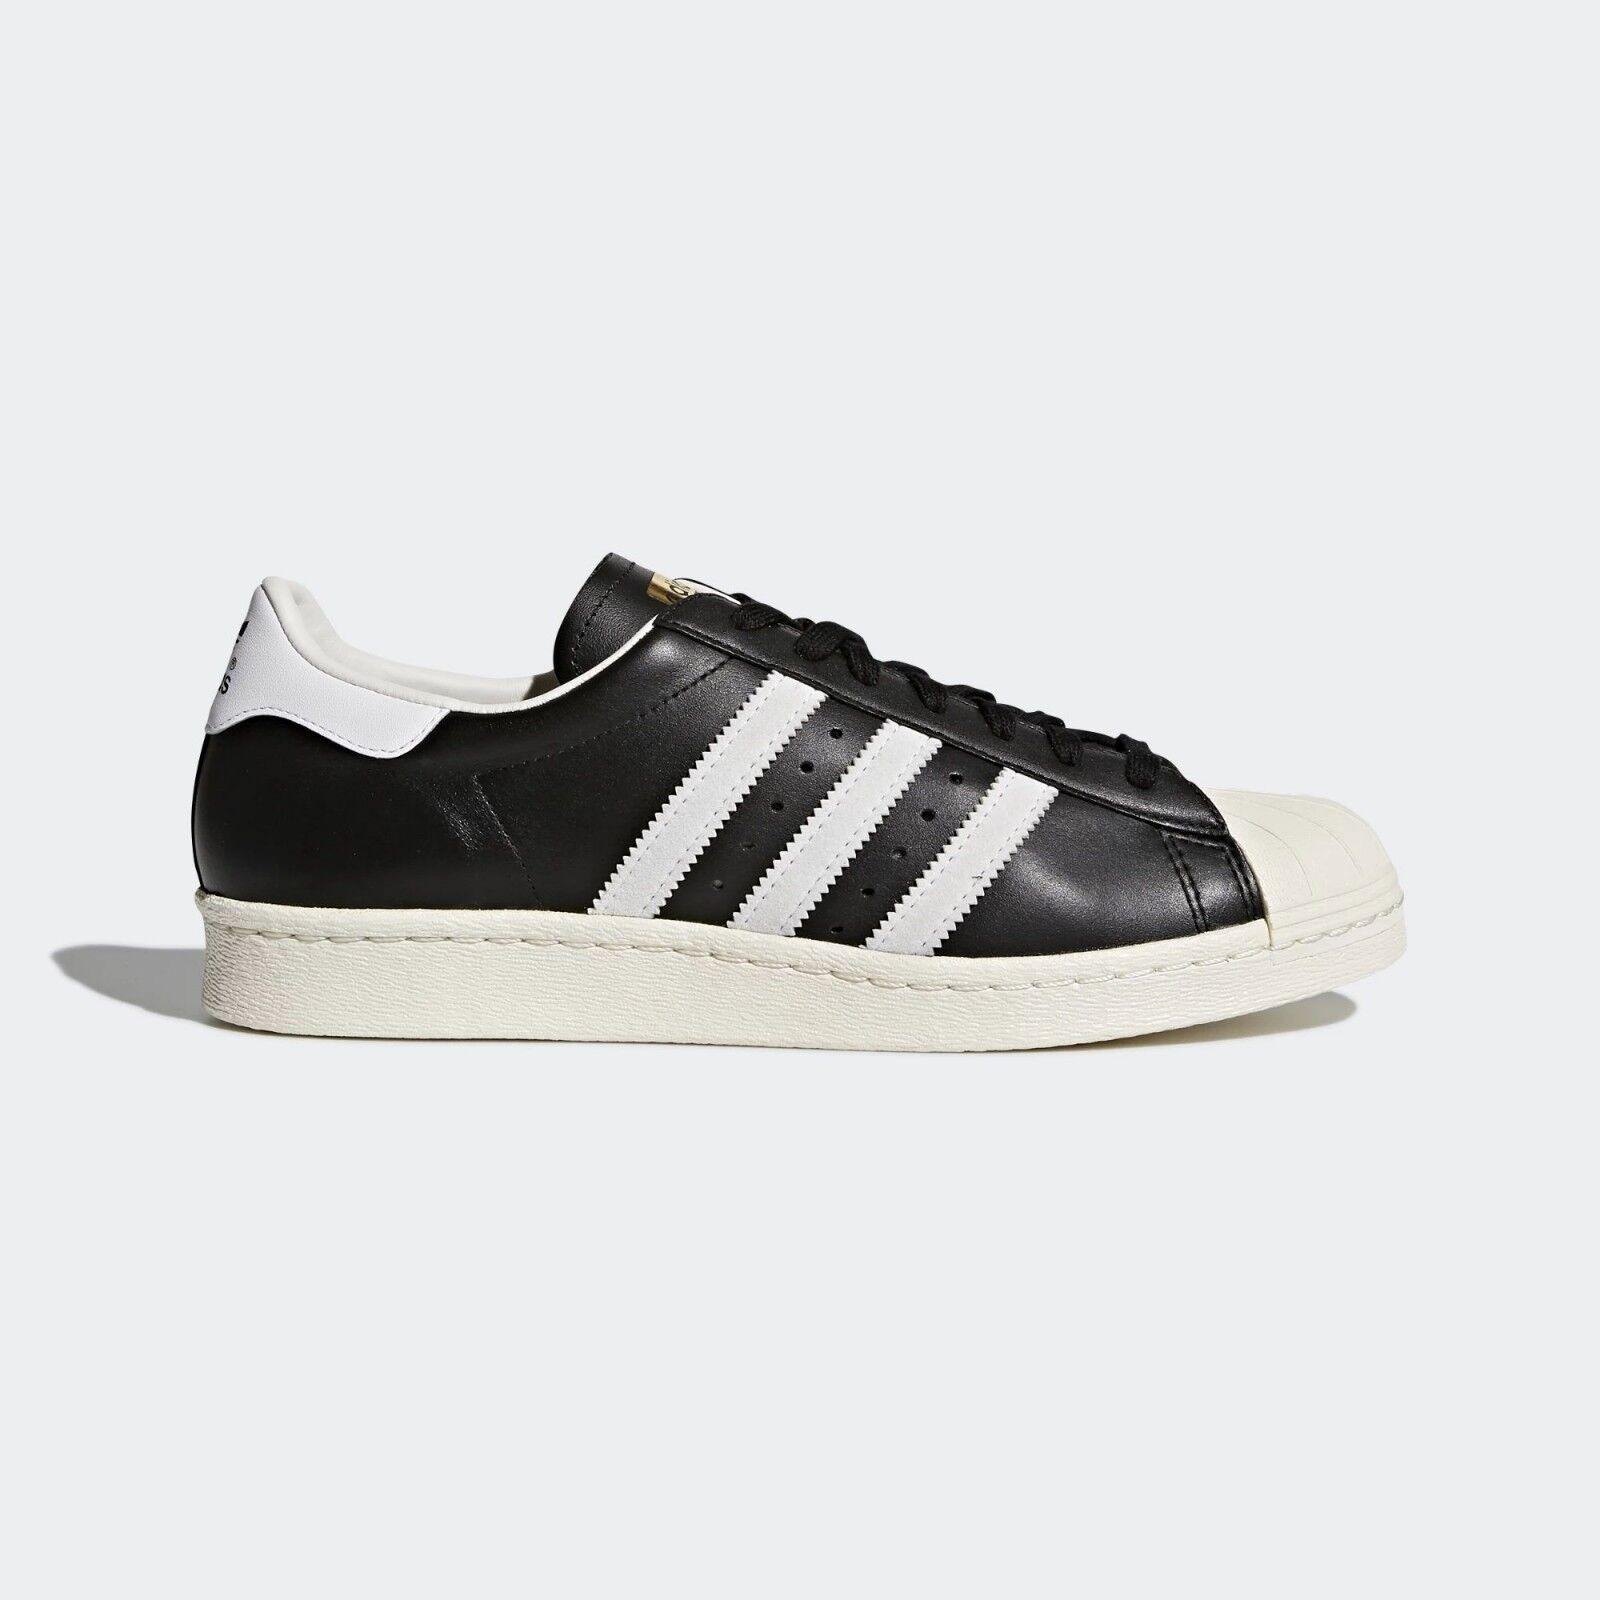 Adidas shoes Originals SUPER STAR ANNÉES 80 shoes 40-41-42-43-44-45